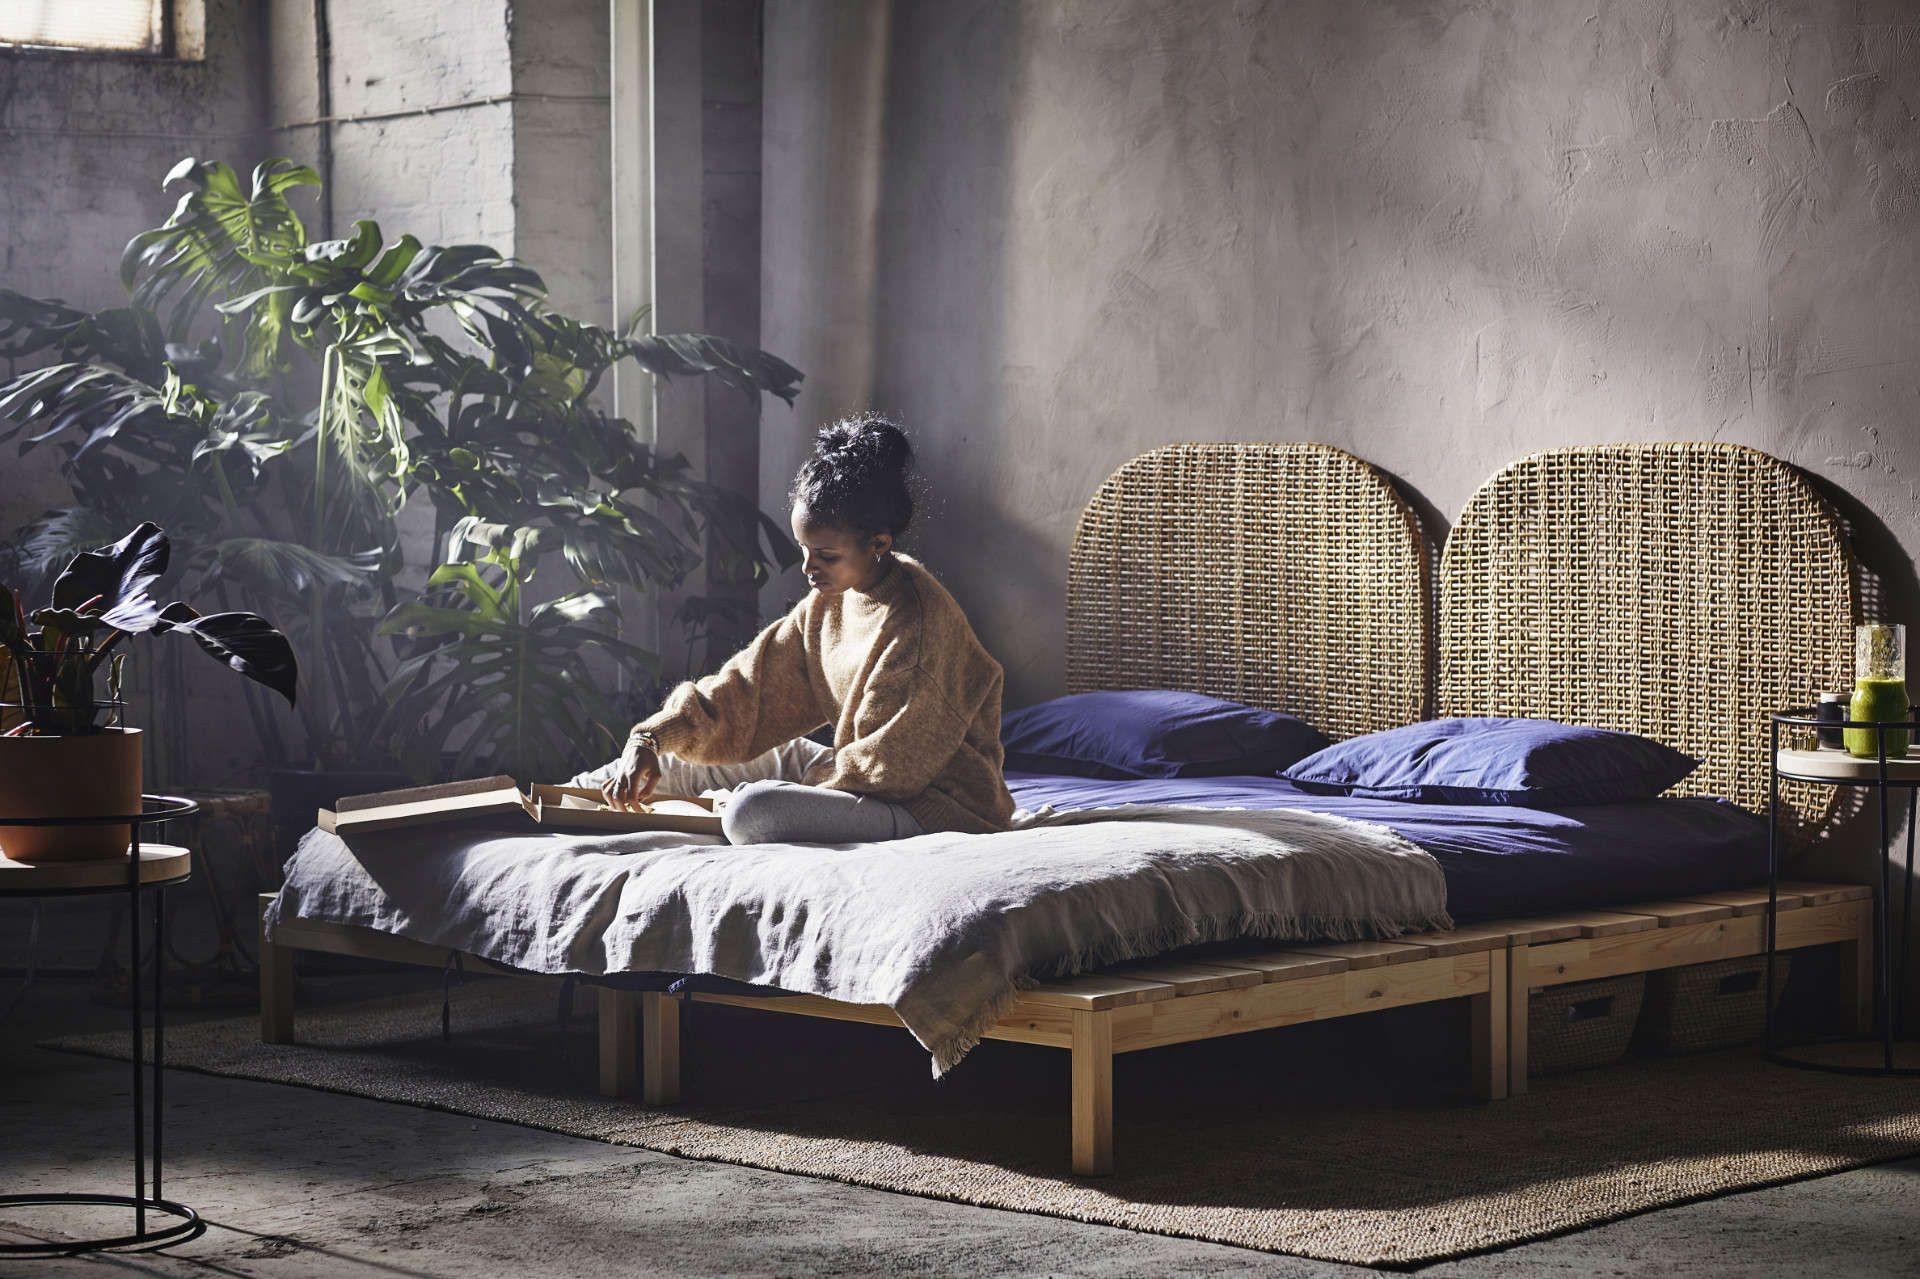 Ikea Hjartelig Kollektion Naturlich Wunderschon Ikea Plattform Bett Schlafzimmermobel